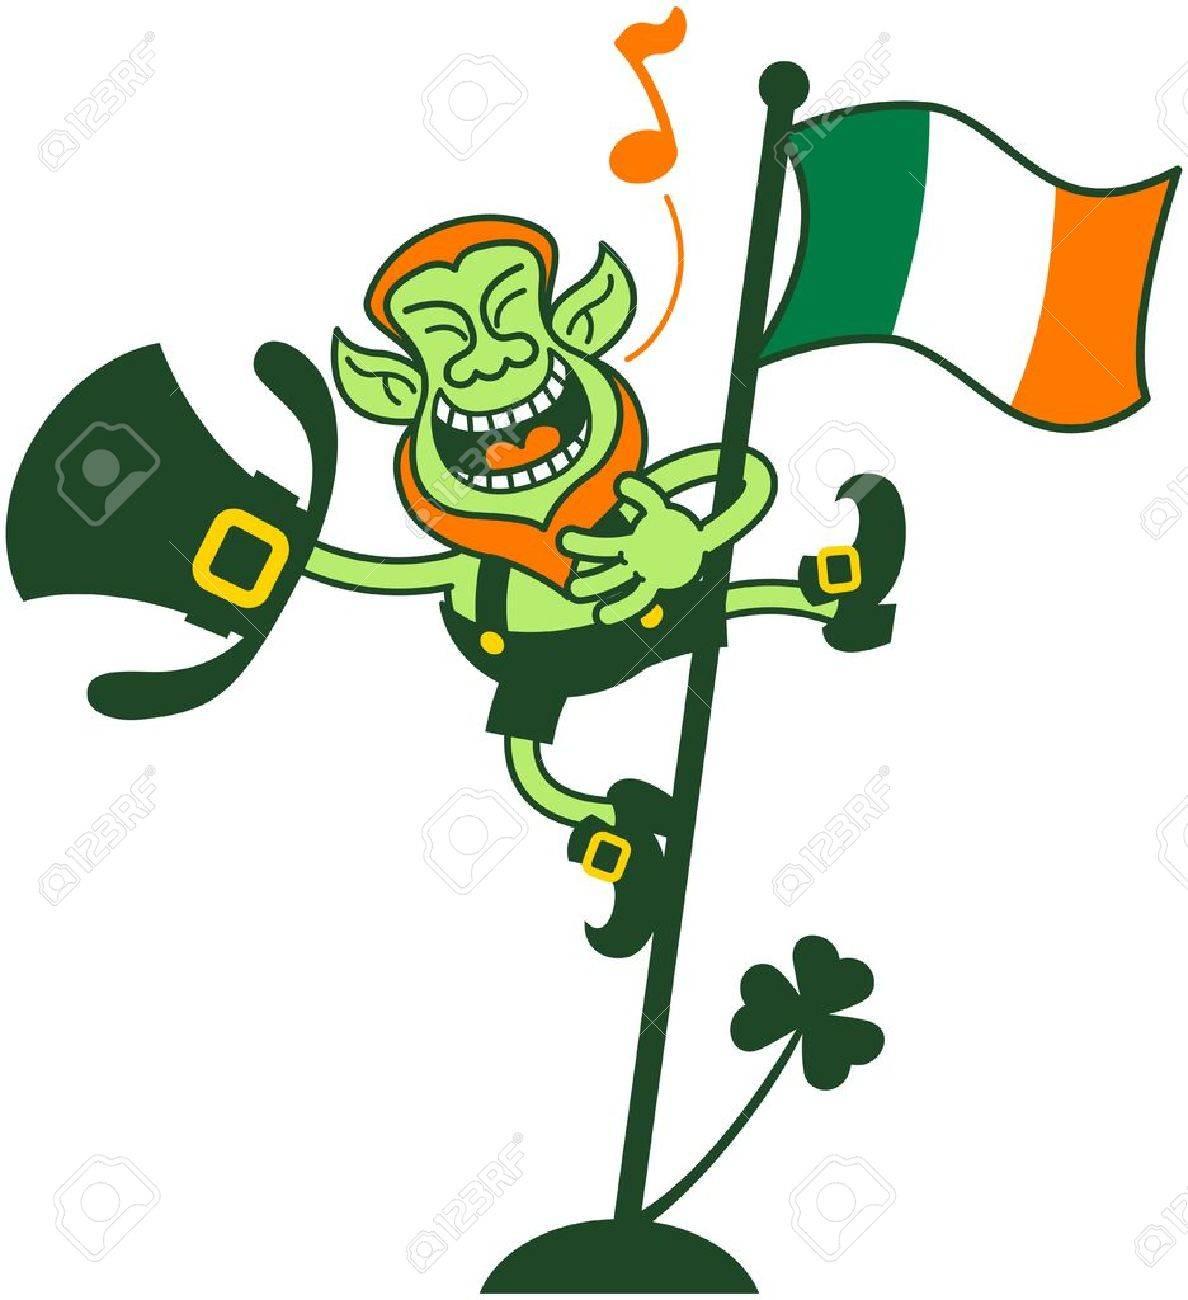 Happy and proud leprechaun singing after having climbed an Irish flag pole Stock Vector - 18132418